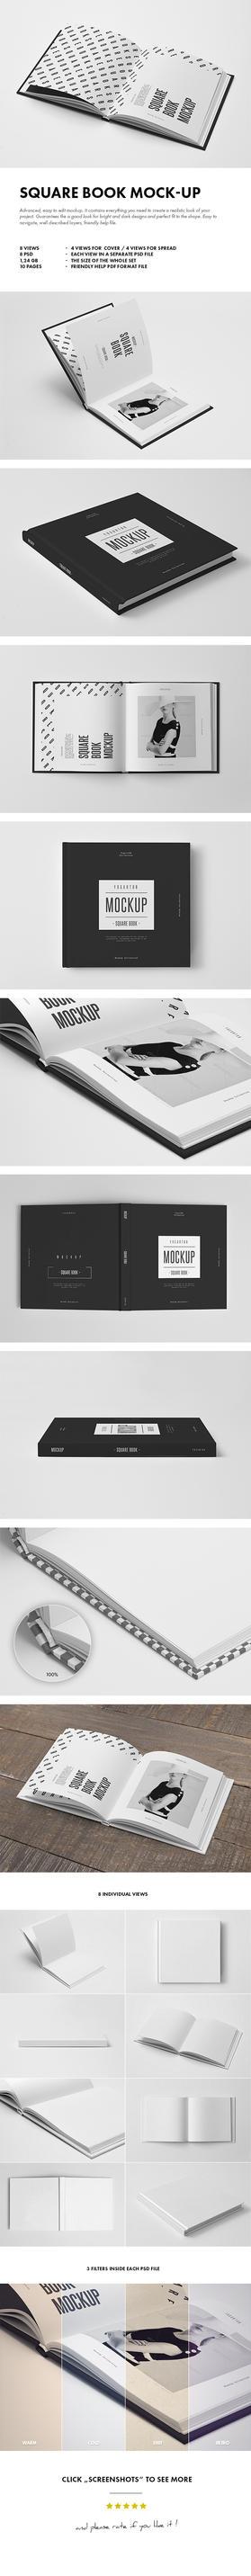 Square Book Mock-up by yogurt86